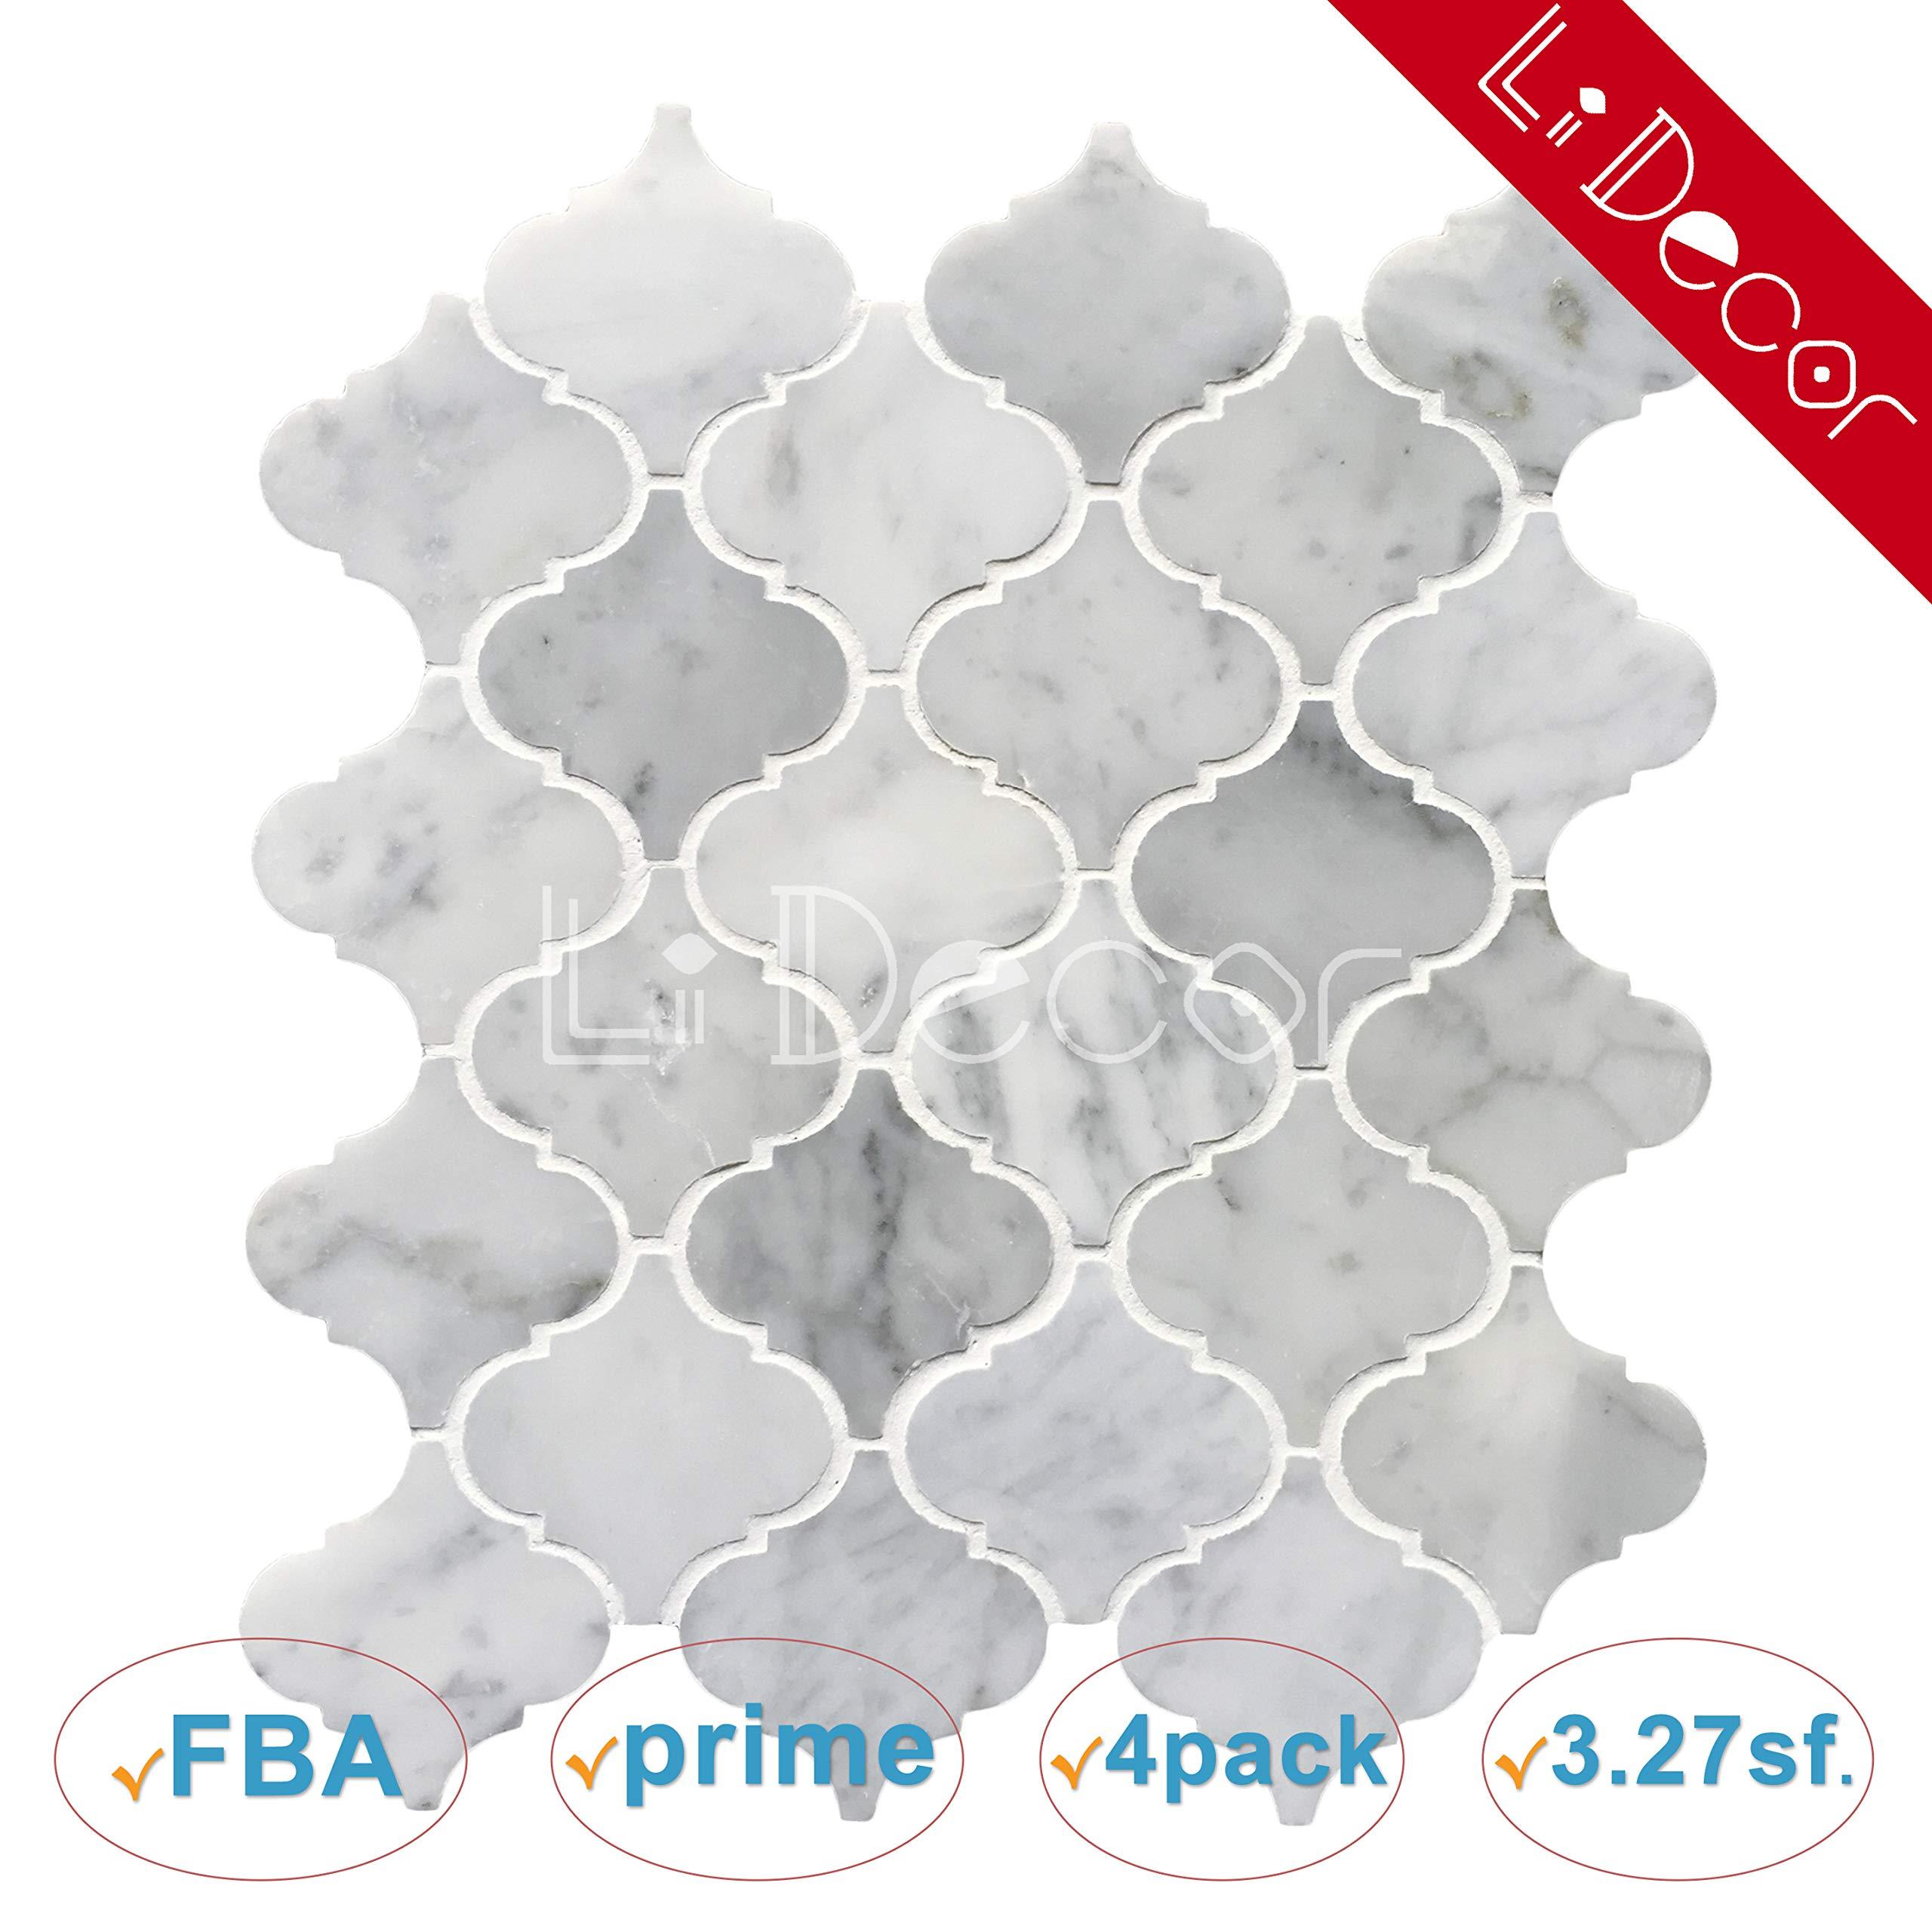 Italian Carrara White Arabesque Lantern Polished Carrera Marble Mosaic Tiles for Kitchen Bathroom Shower Counter Wall Floor Backspalsh Tiles by Li Decor